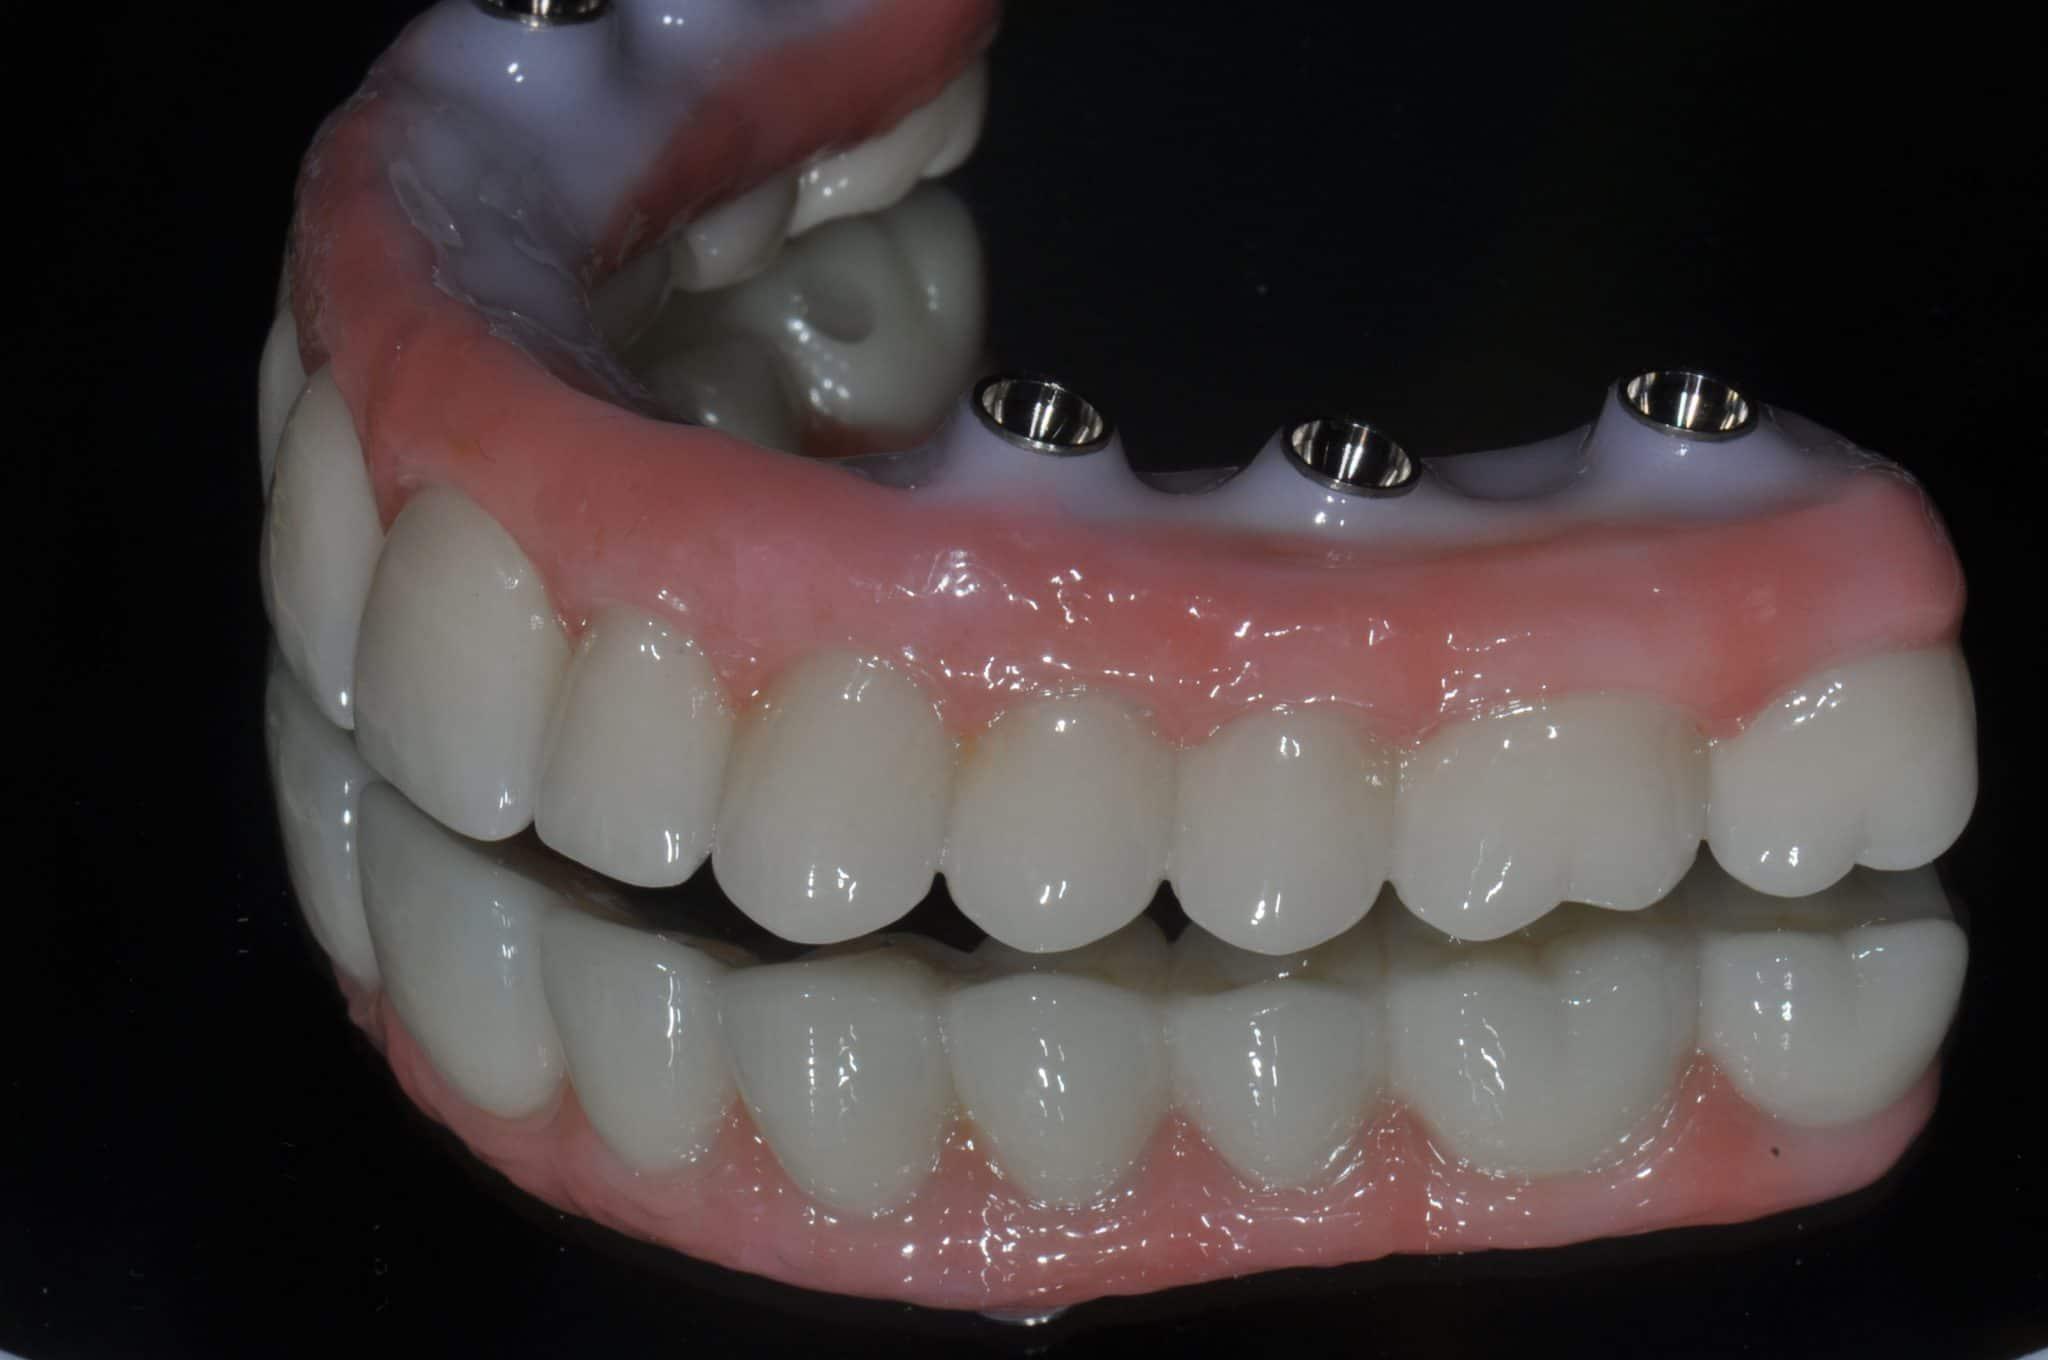 Dental Implant Teeth - Dental Image